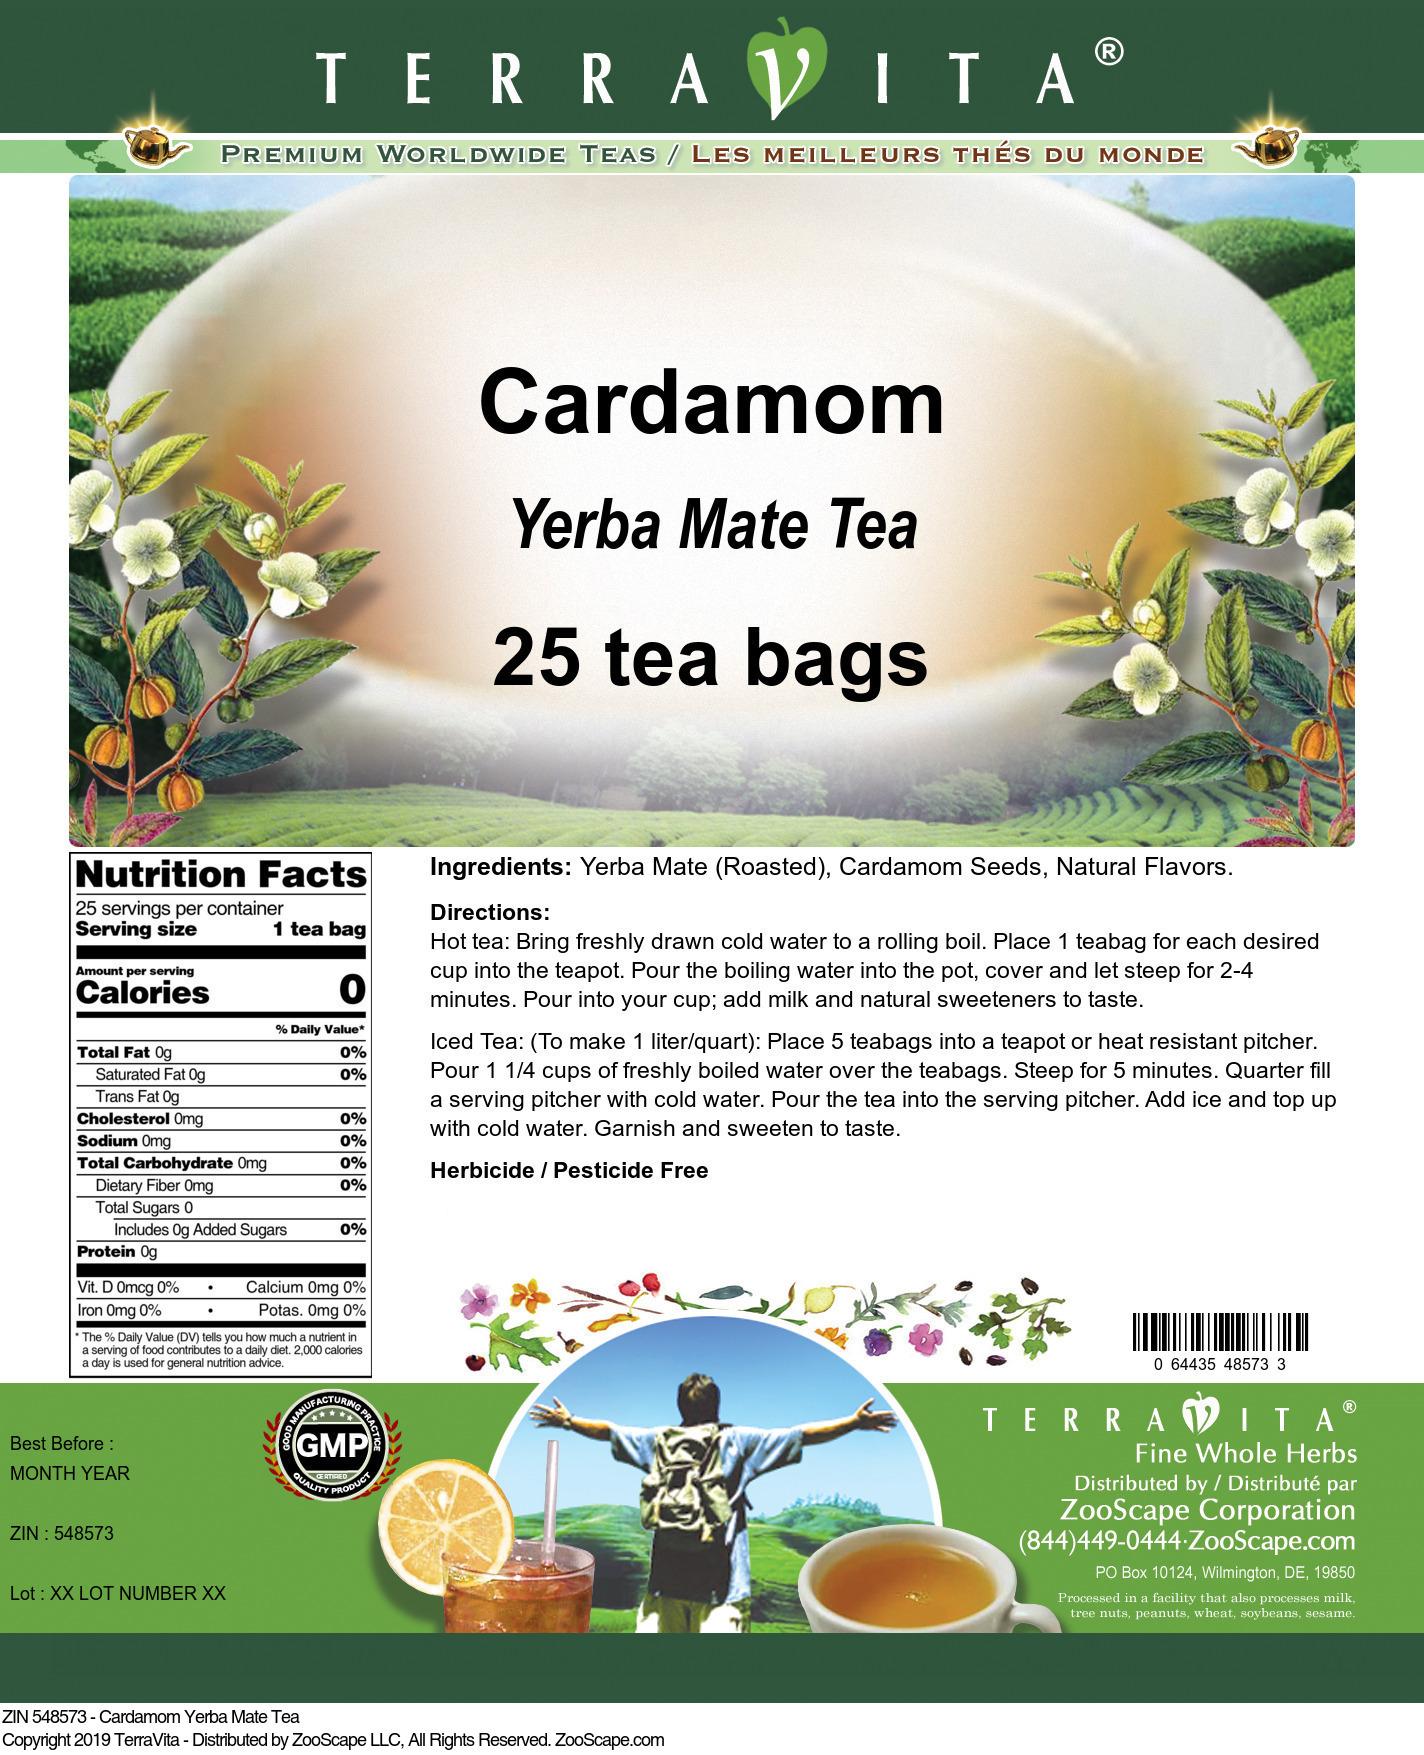 Cardamom Yerba Mate Tea